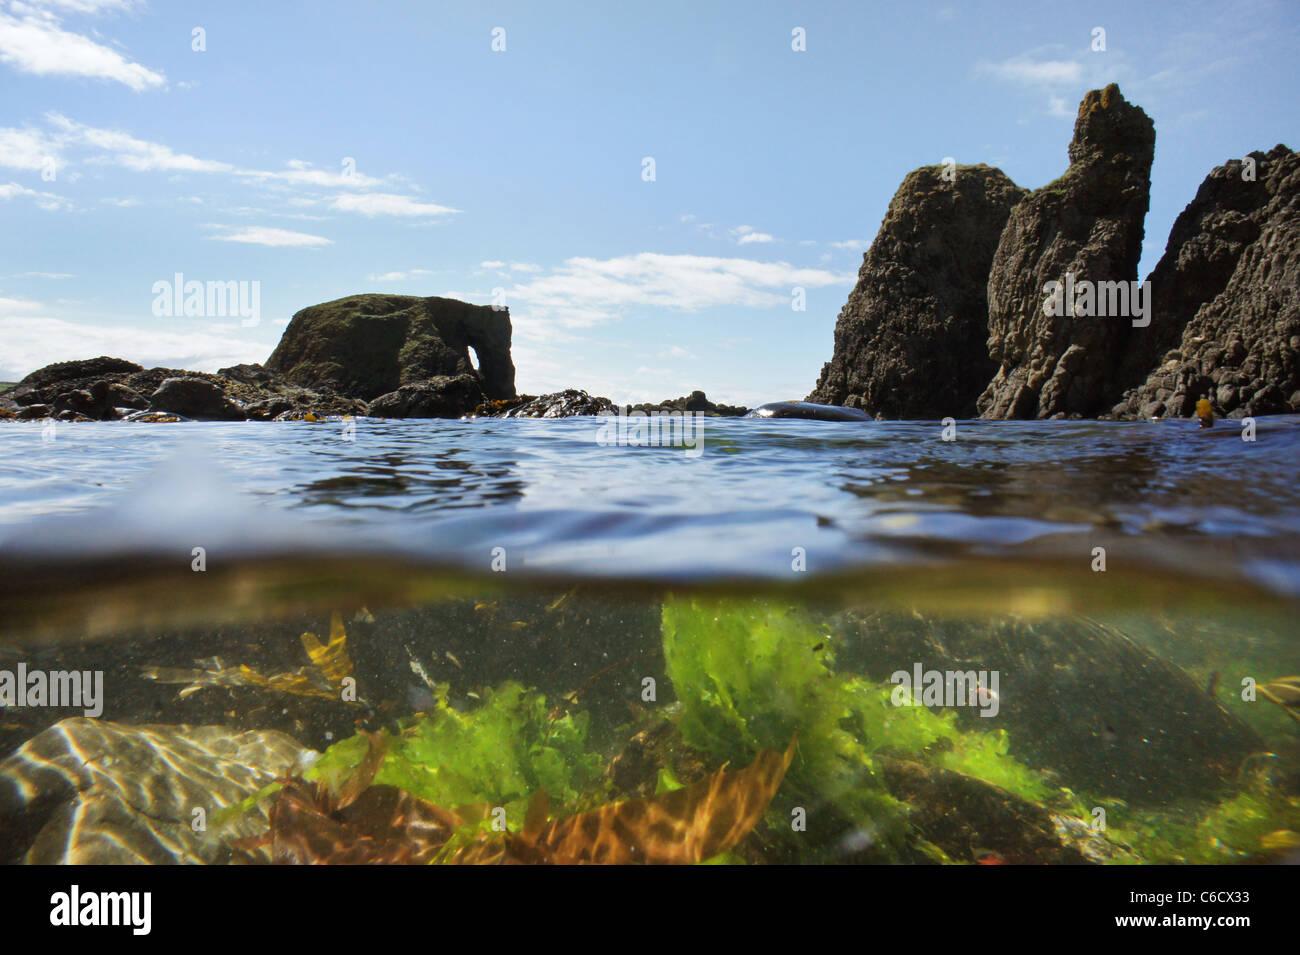 Elephant Rock, Ballintoy,  Co Antrim in Northern Ireland. - Stock Image